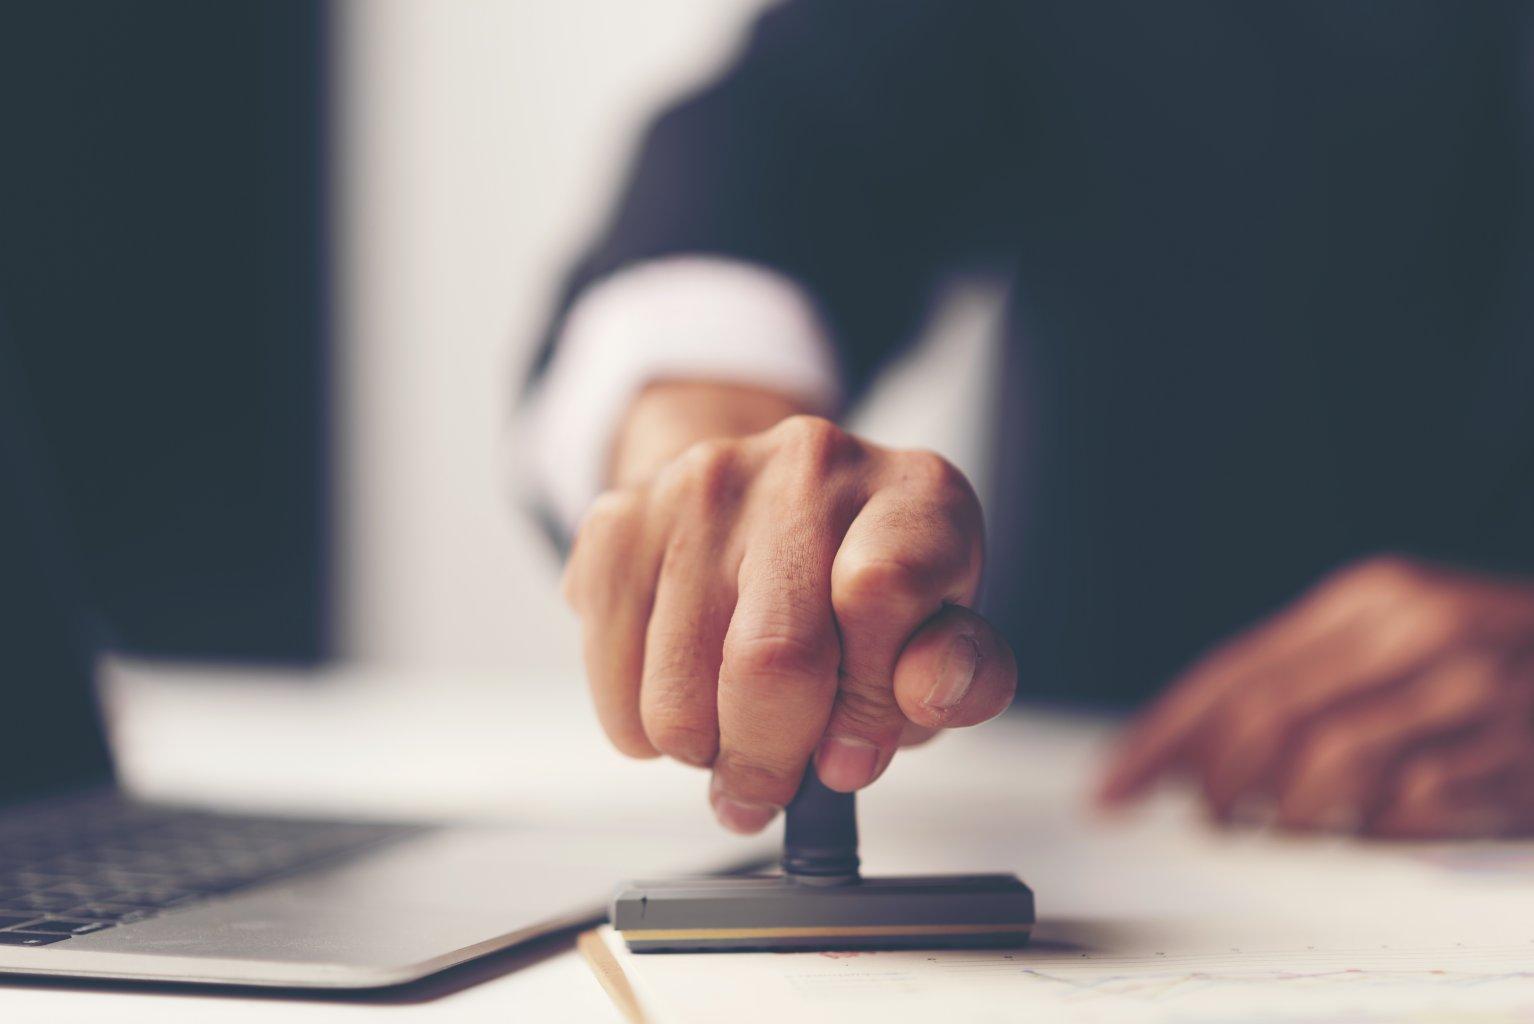 Employee Termination Without Cause - Ontario Employer Advice